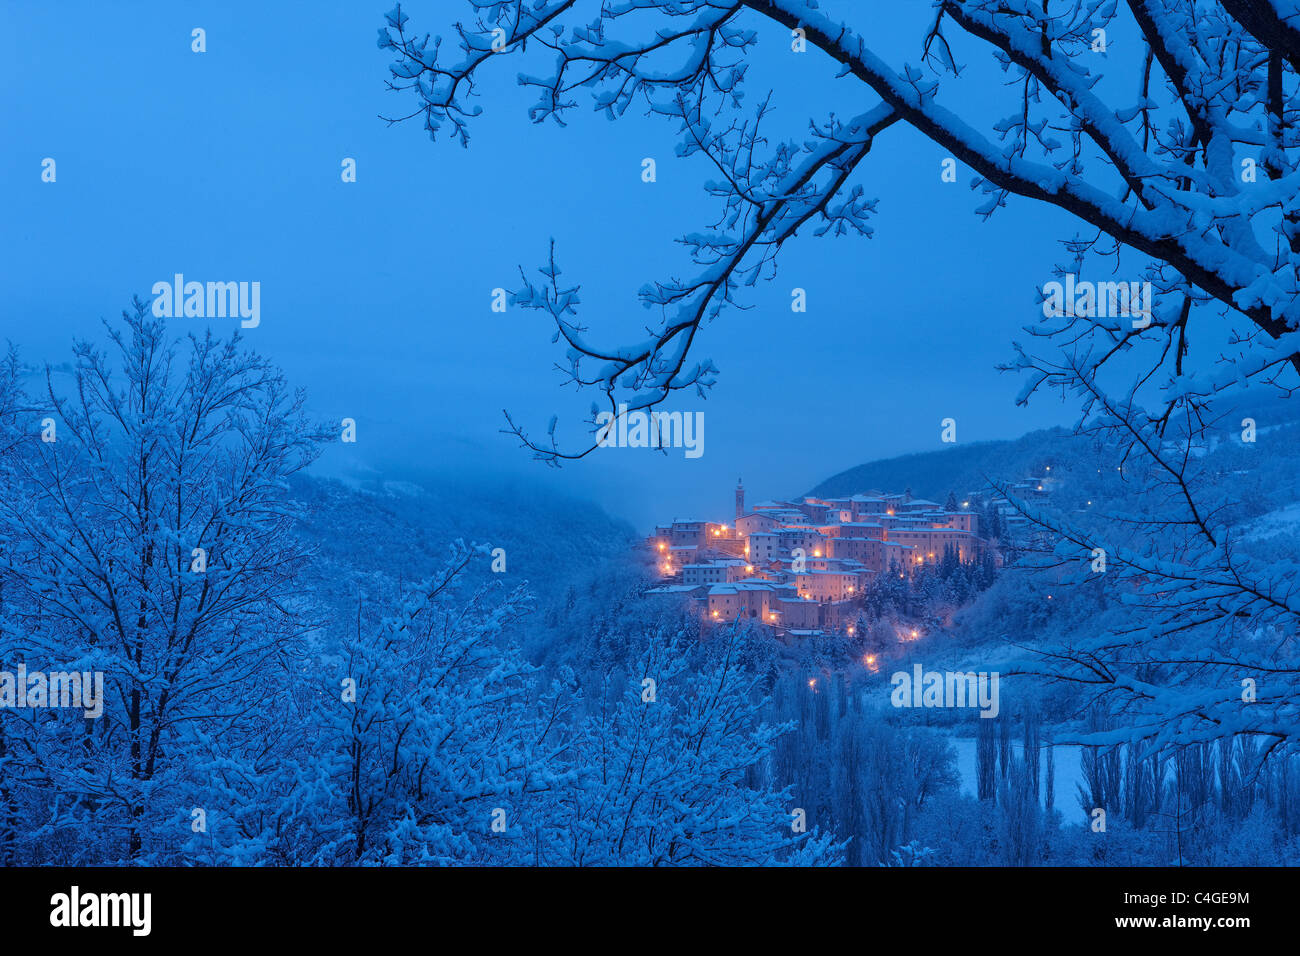 Preci à l'aube en hiver, Valnerina, parc national Monti Sibillini, Ombrie, Italie Photo Stock